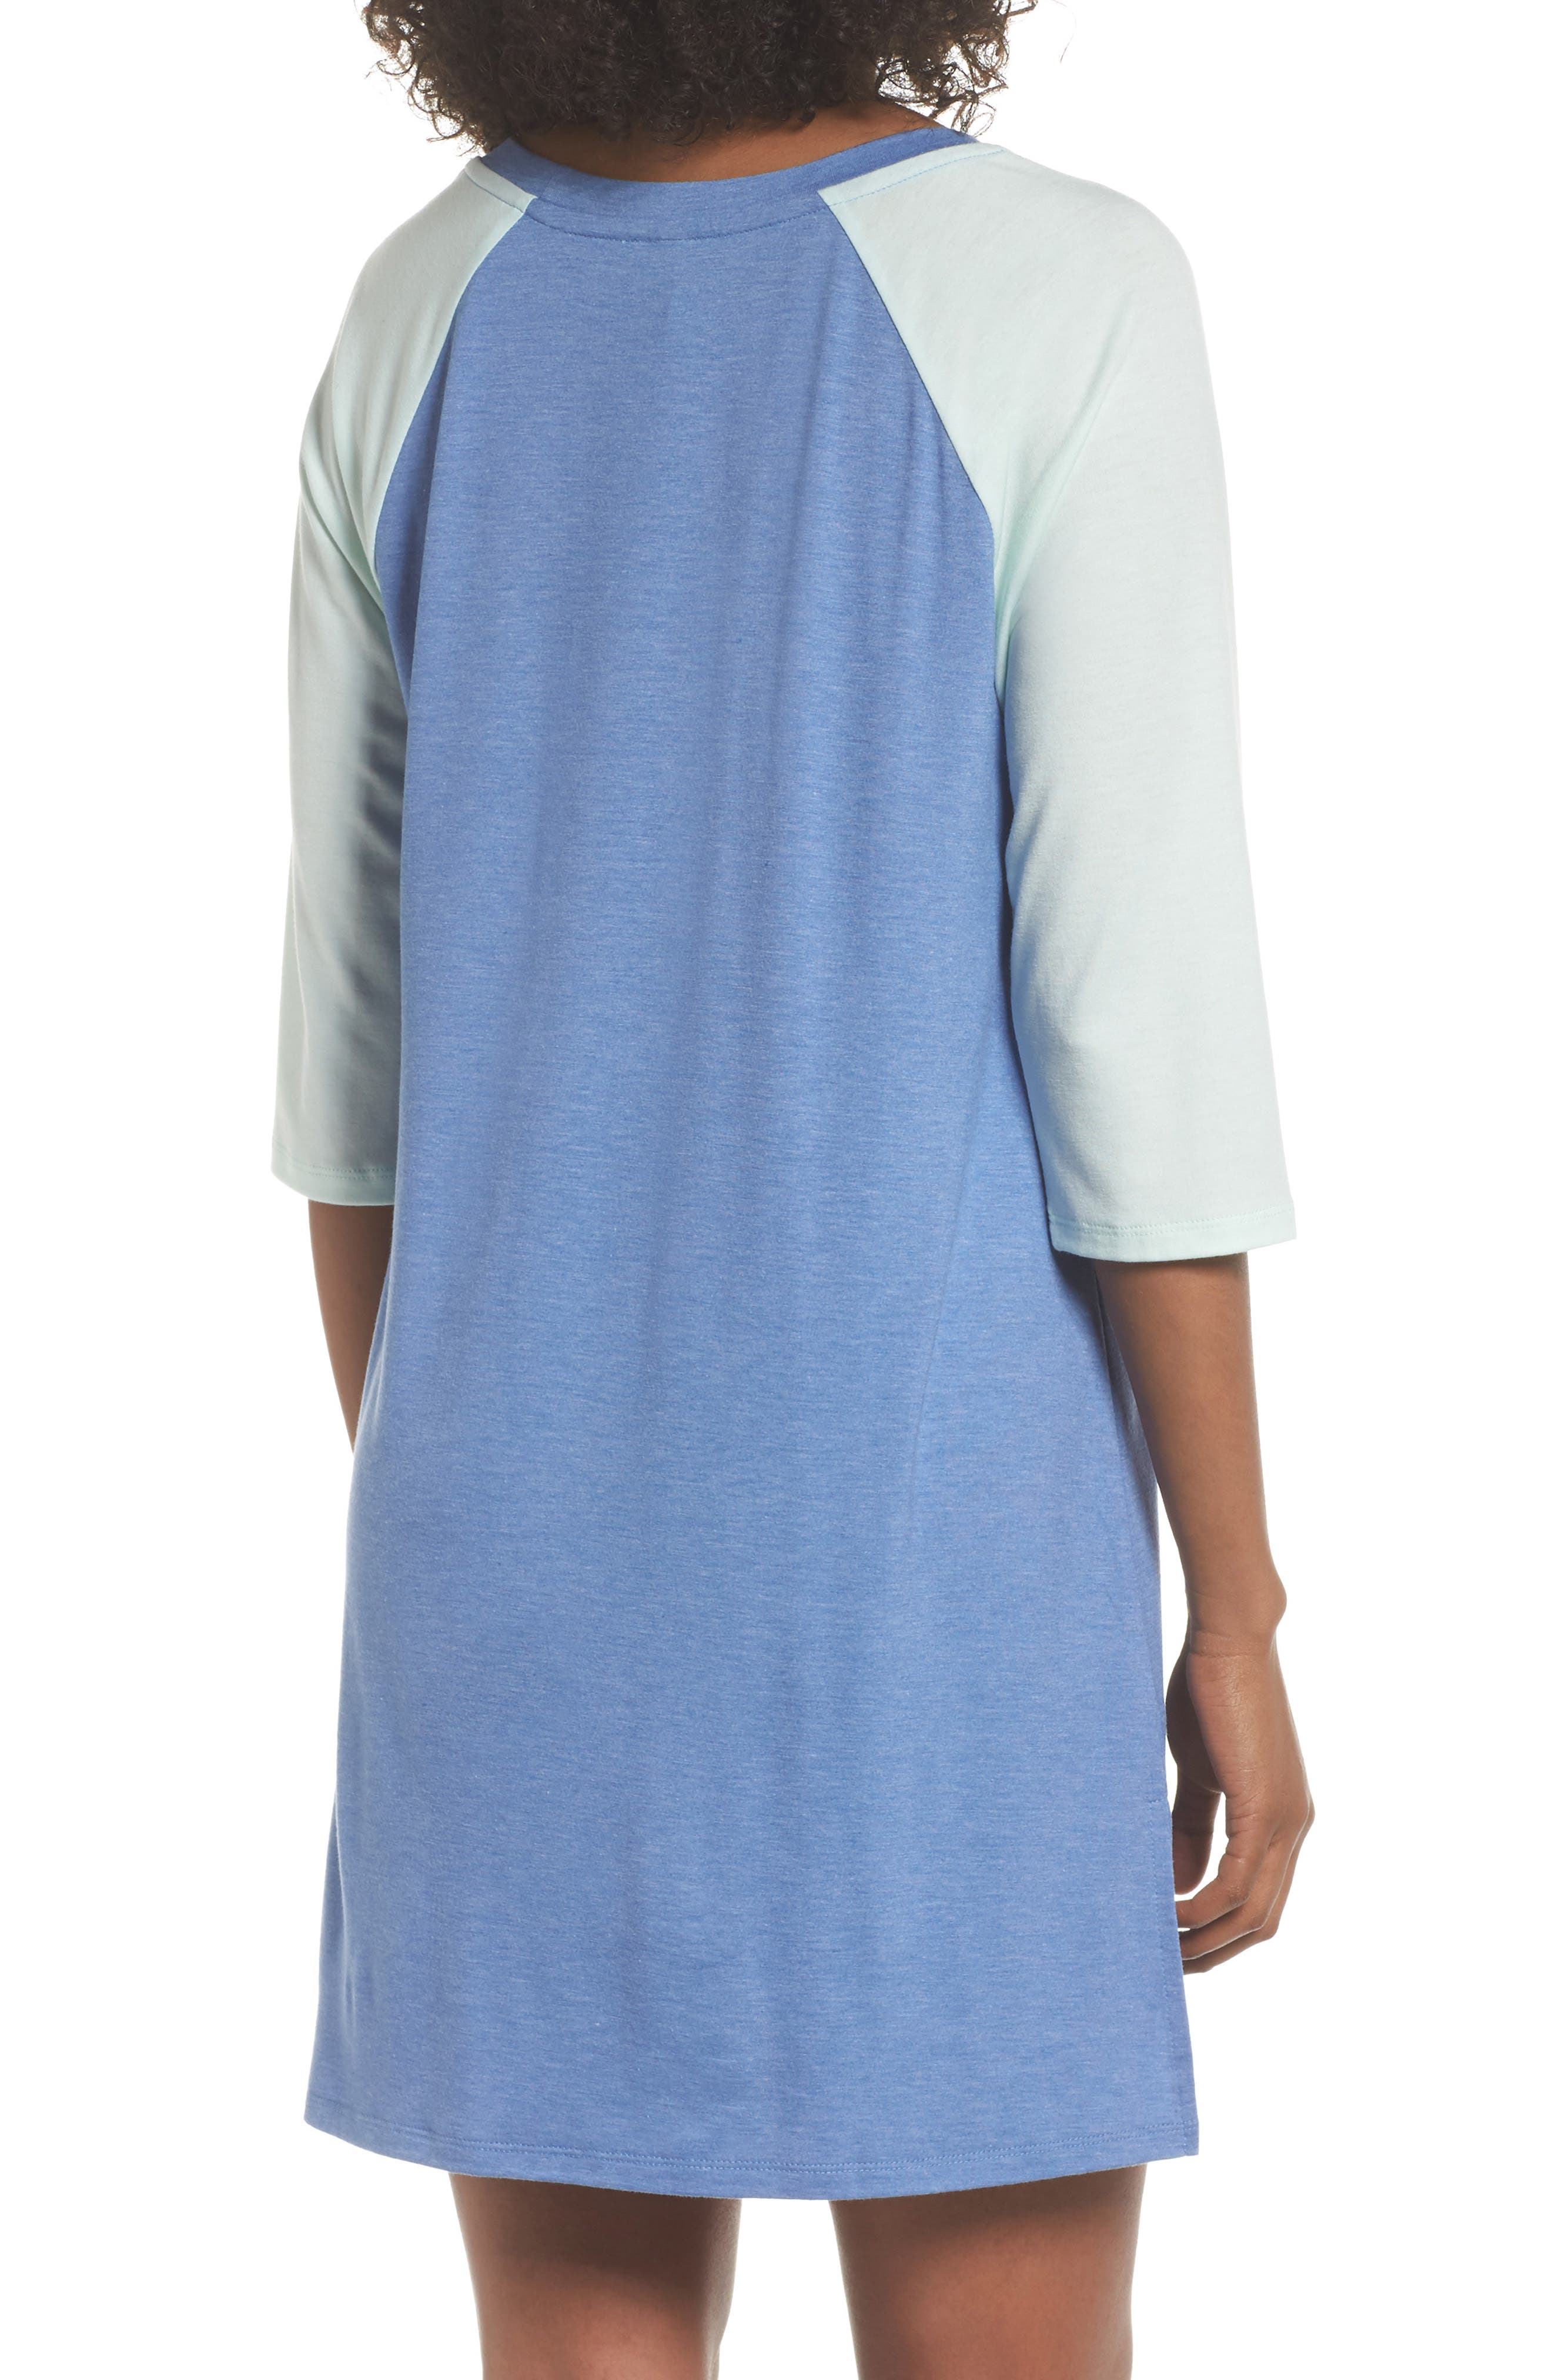 Honeydew All American Sleep Shirt,                             Alternate thumbnail 2, color,                             Sea Breezer